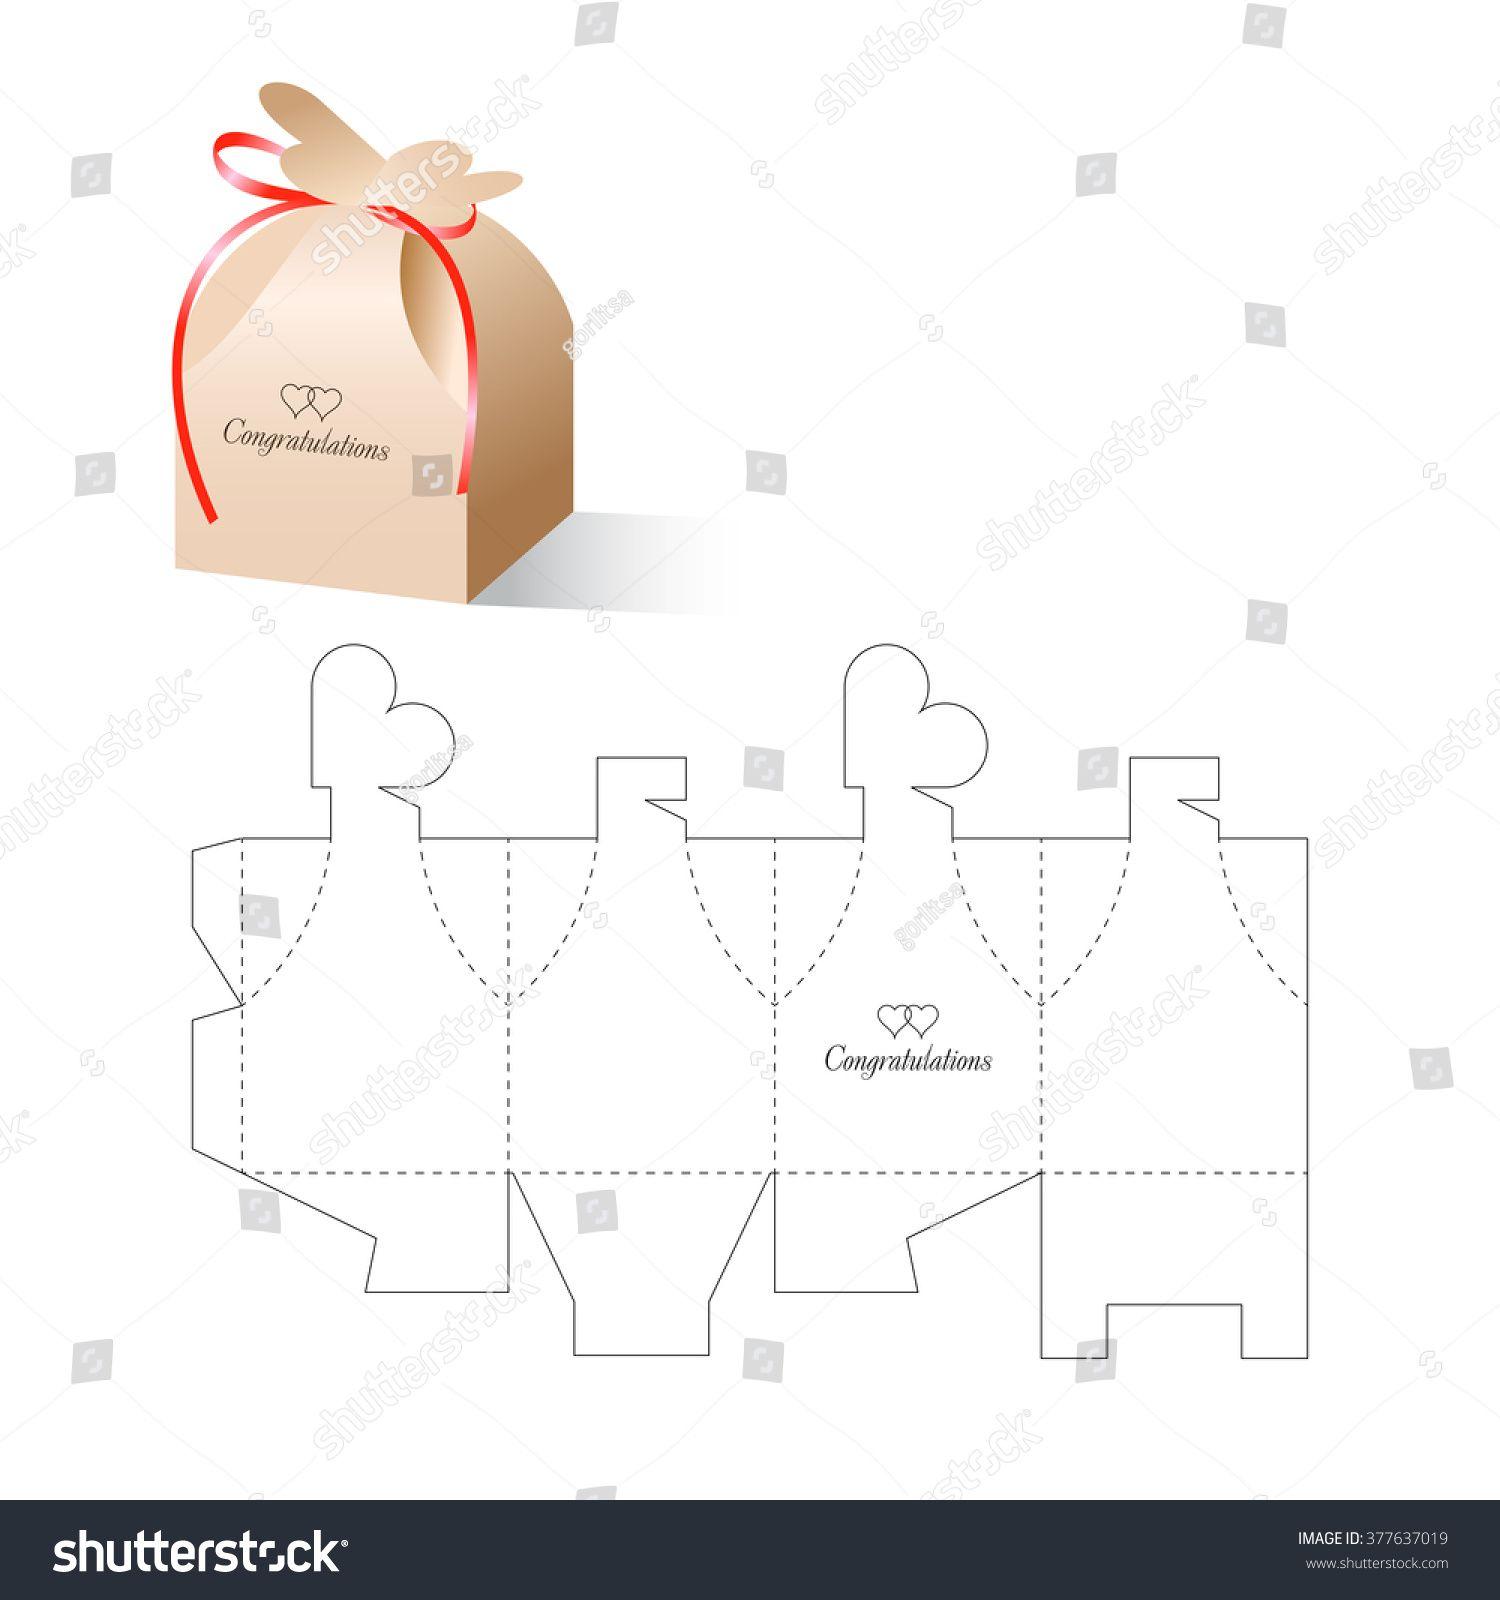 Retail Box with Blueprint Template | Baby | Moldes cajitas ... - photo#33